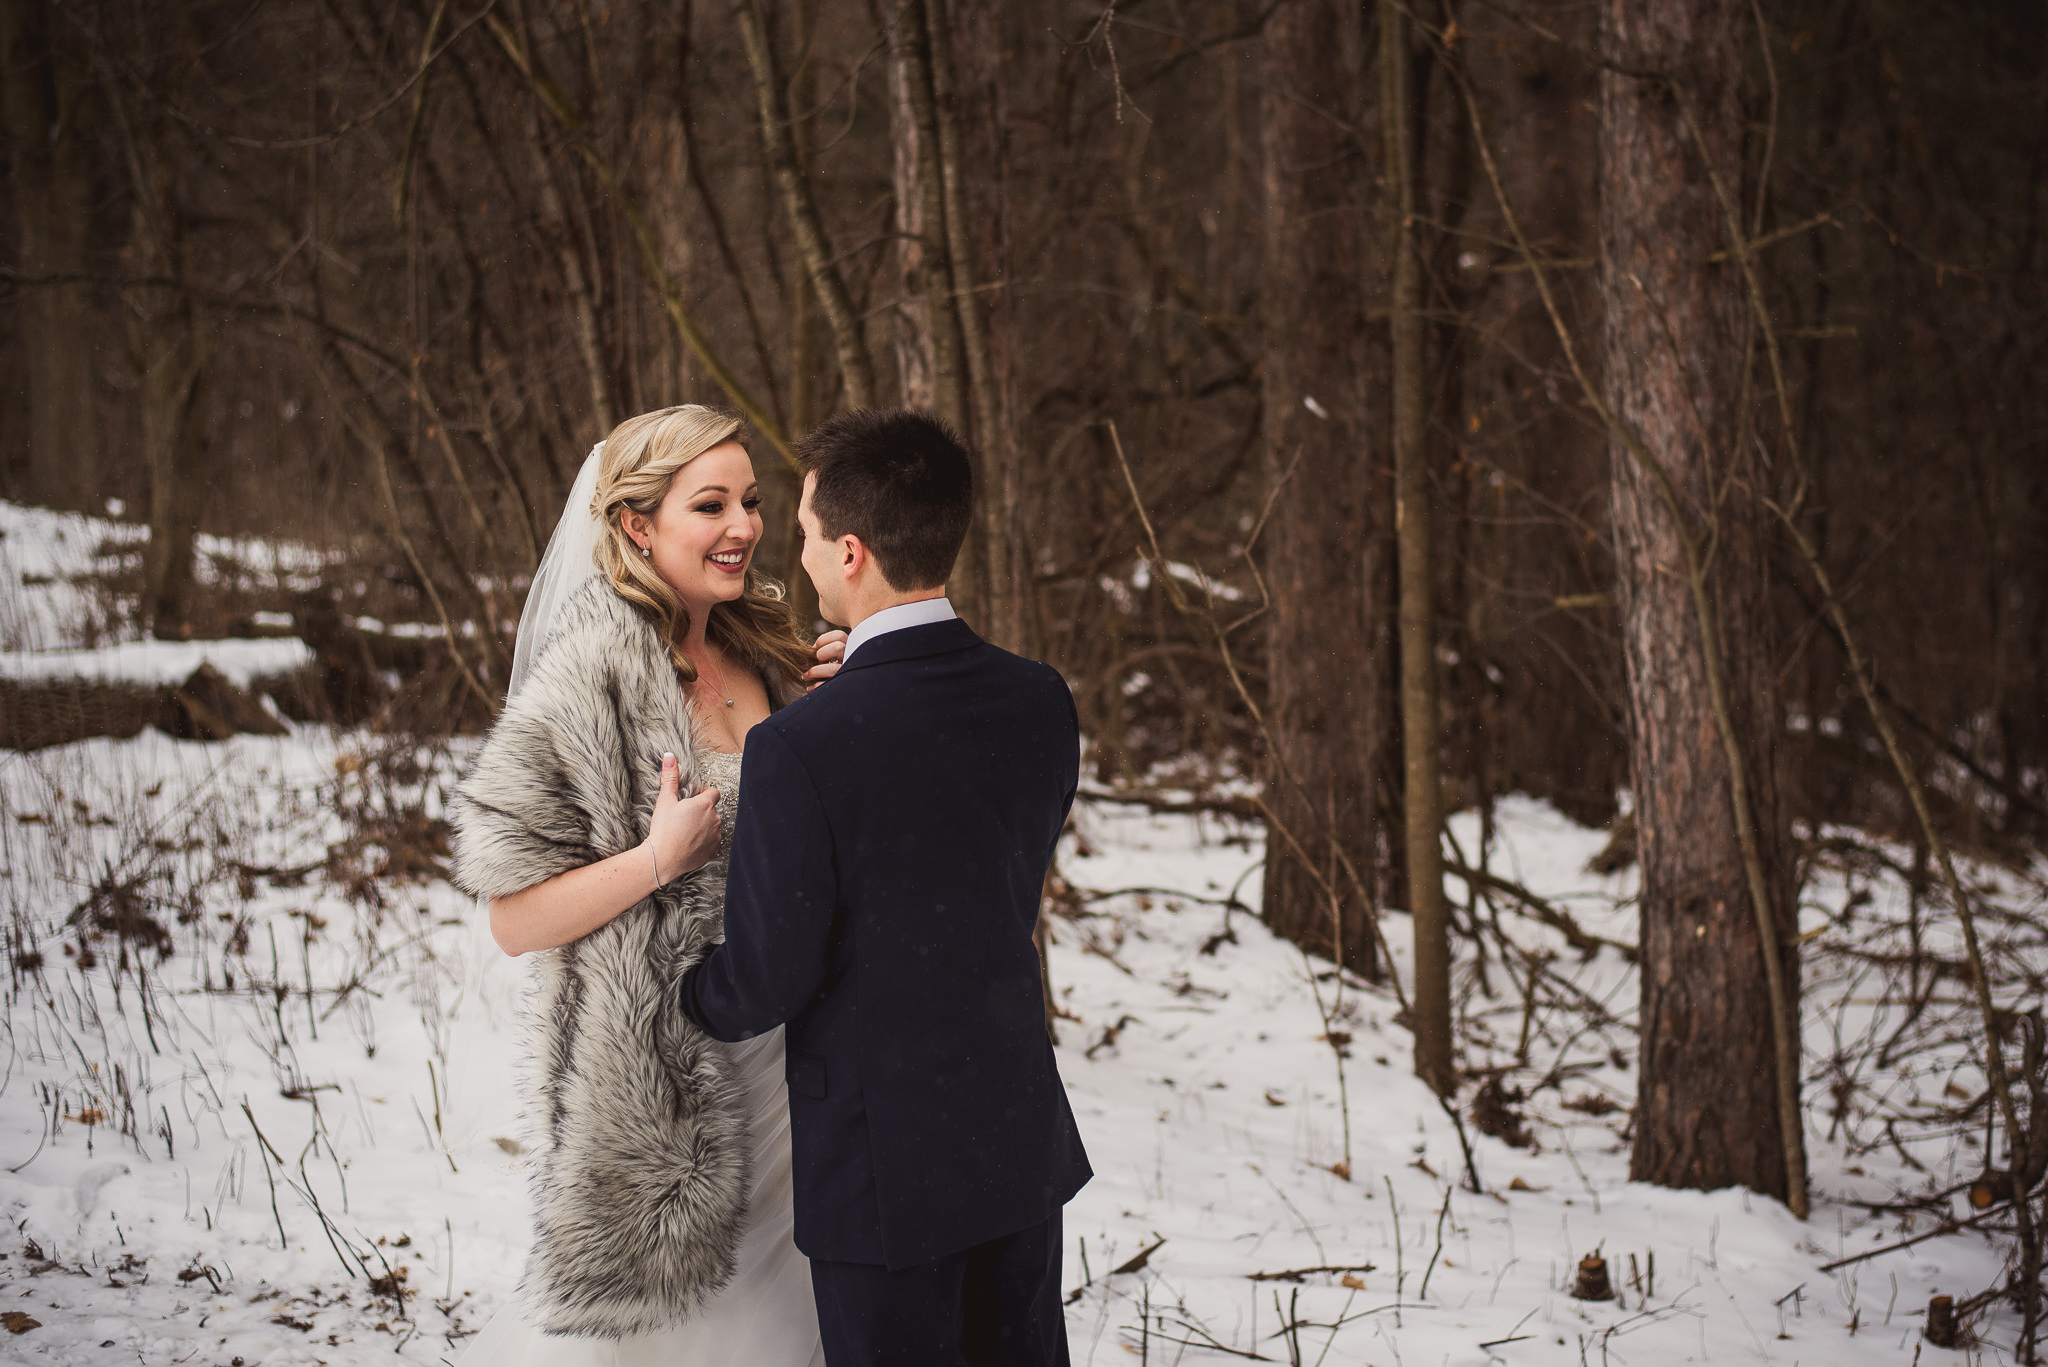 kortright center winter wedding photos 134 - Kortright Center Winter Wedding Photos